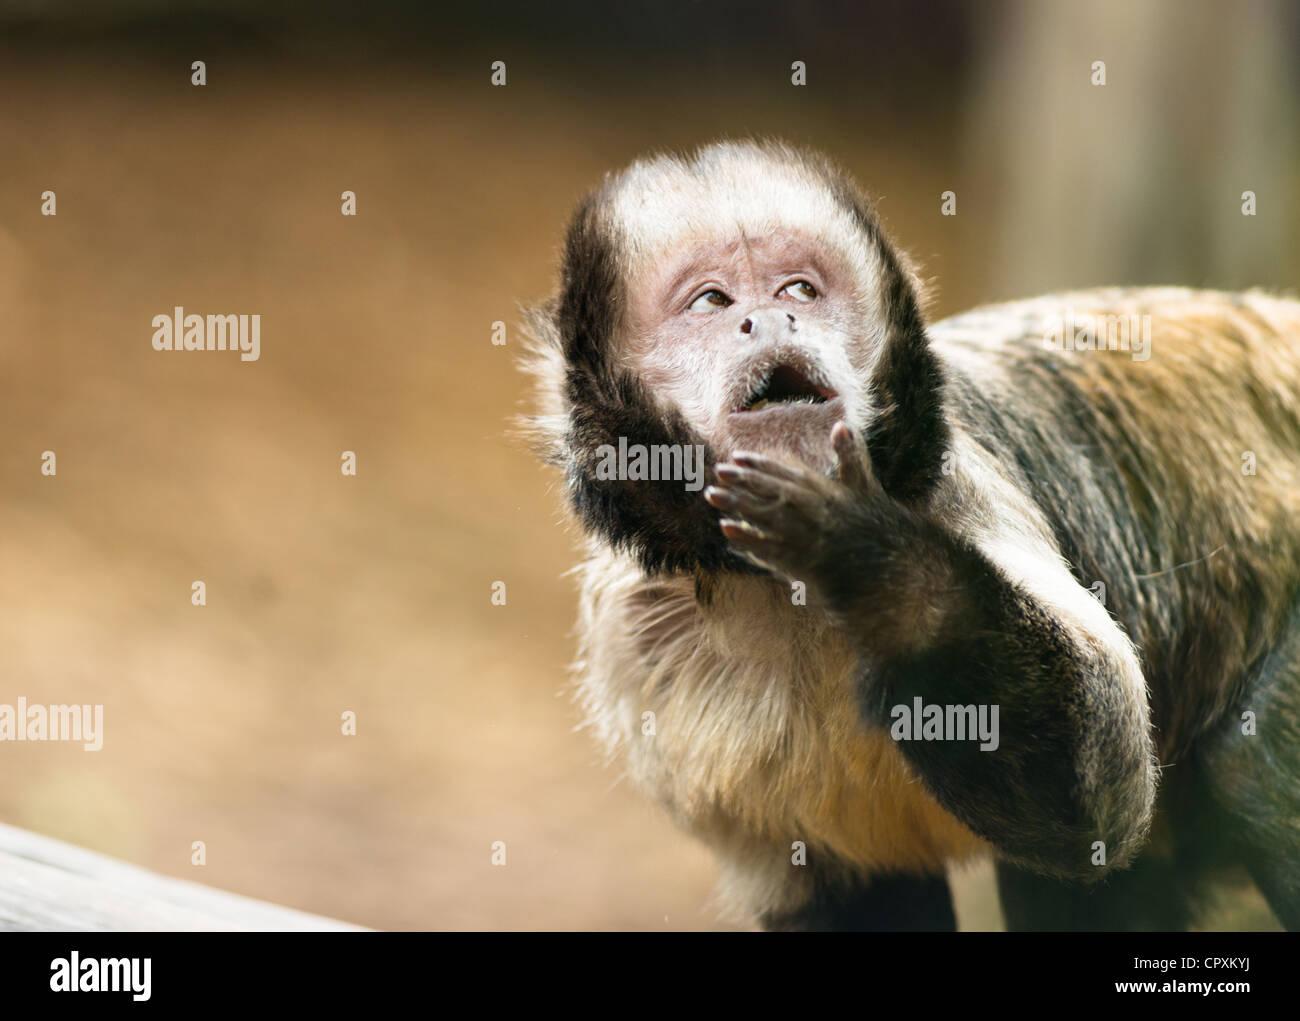 Tufted capuchin monkey (Sapajus apella) with cheeky thoughtful expression. - Stock Image